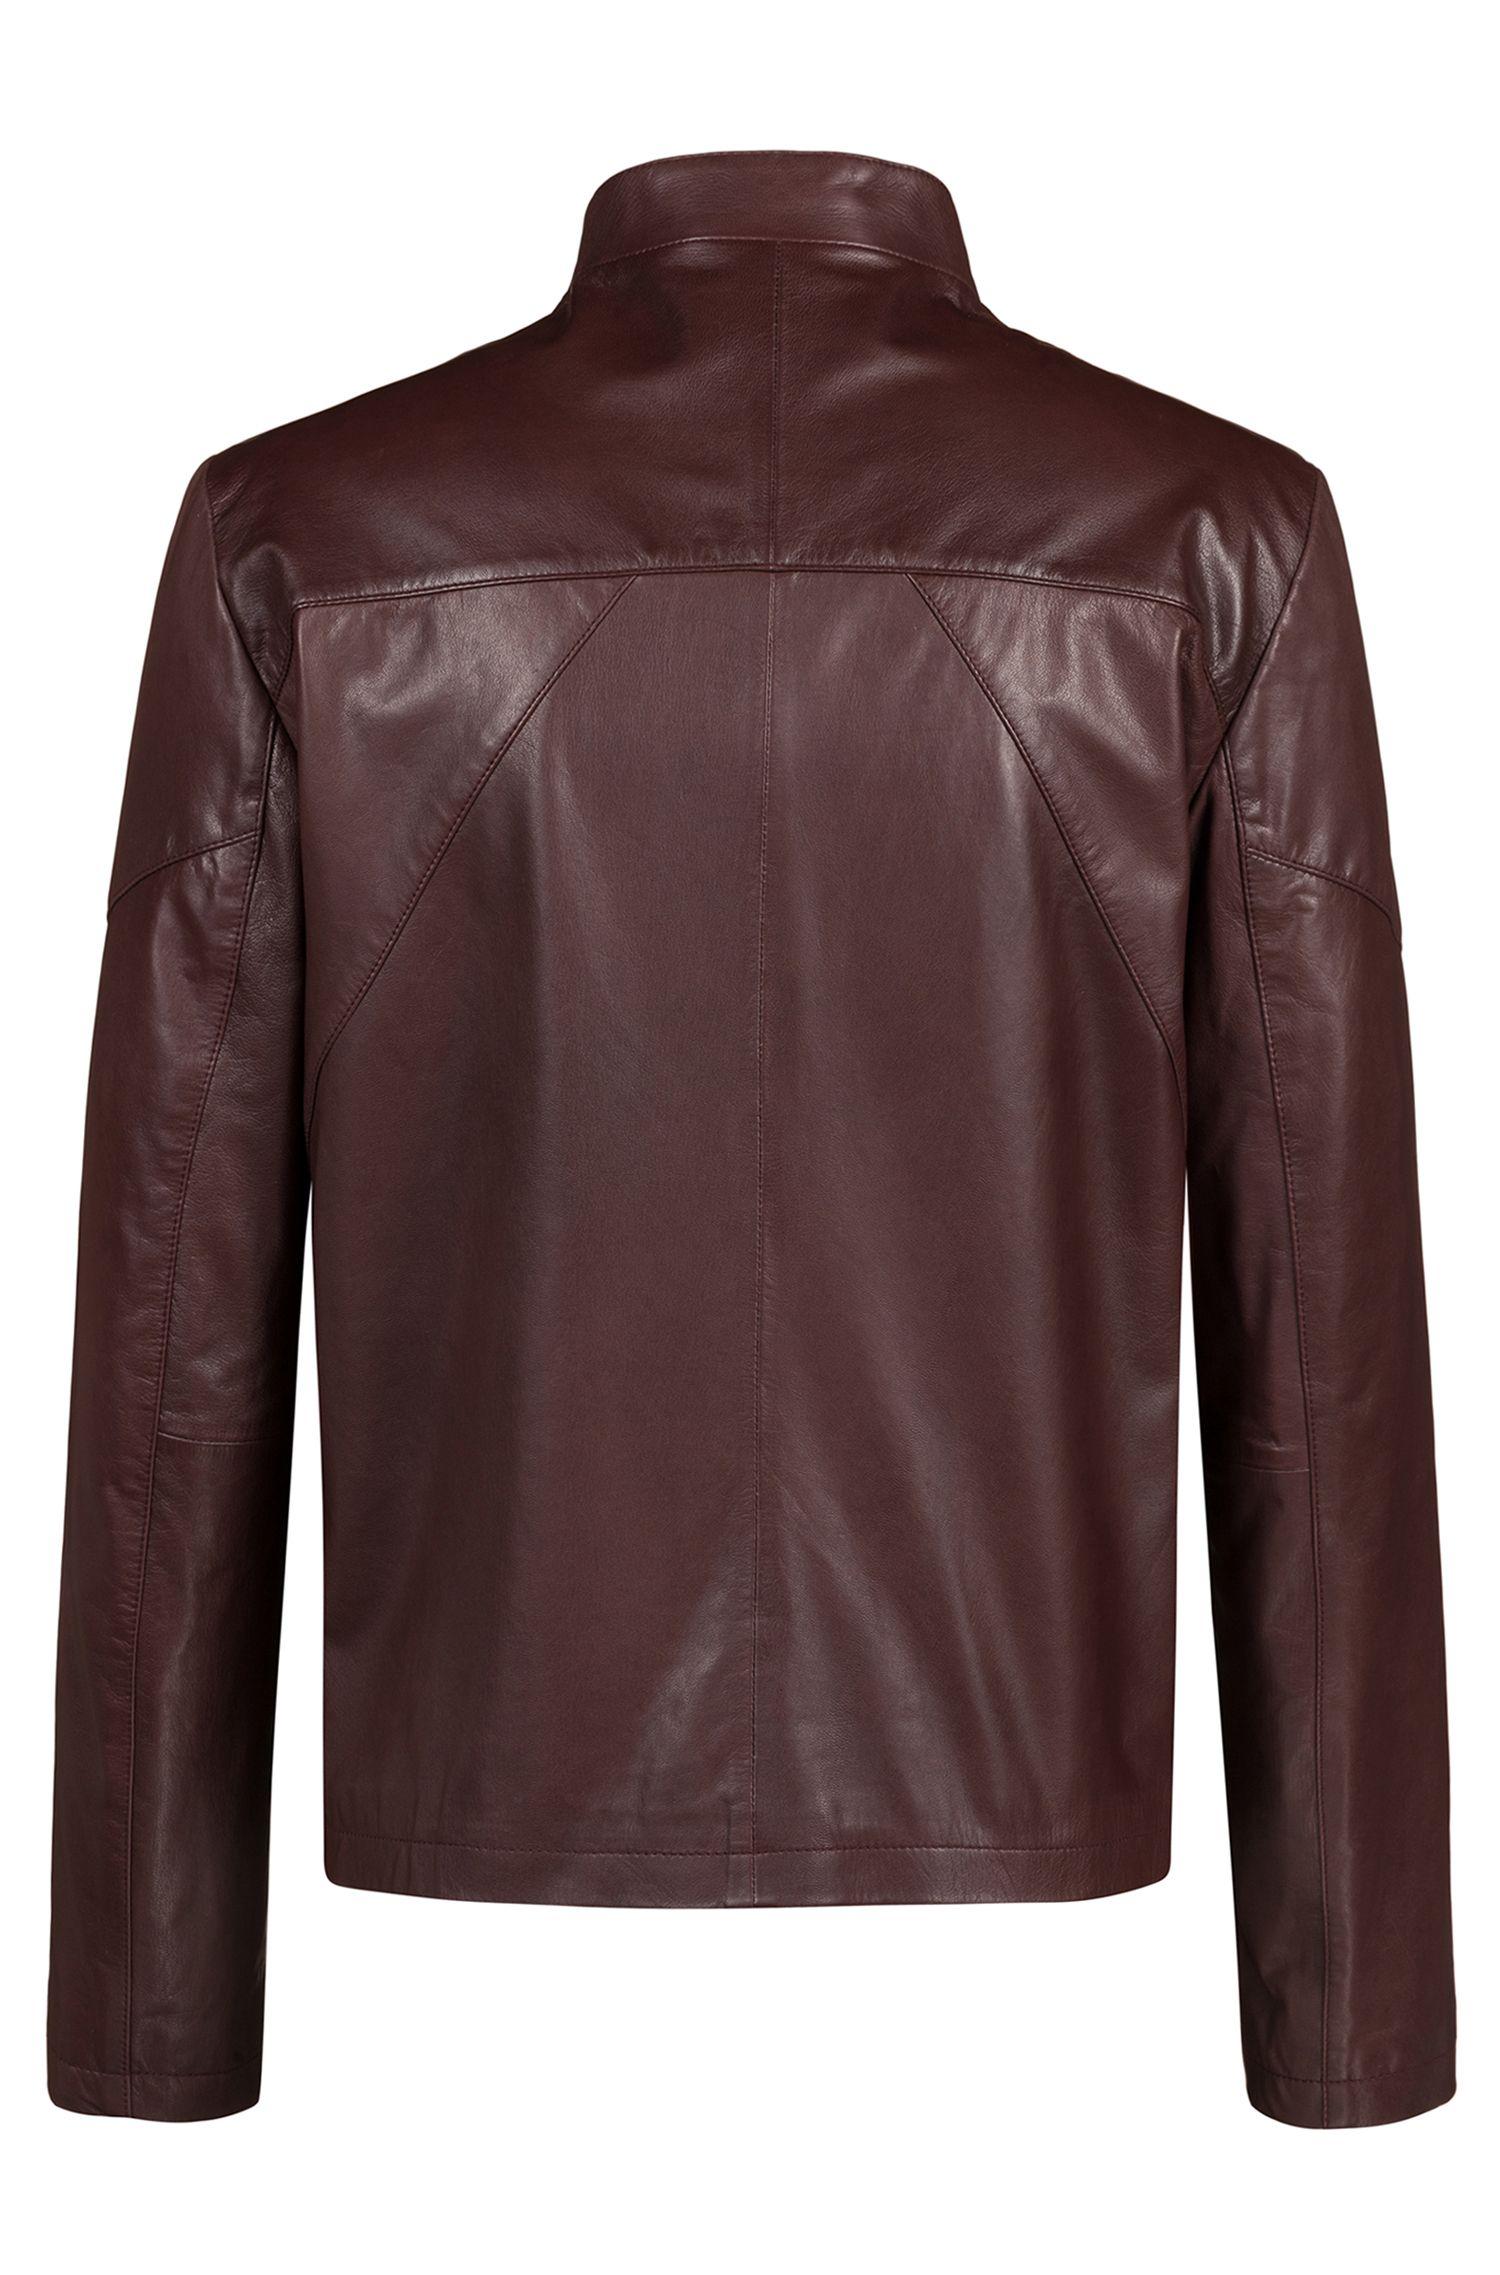 Hugo Boss - Slim-fit biker jacket in nappa leather - 4